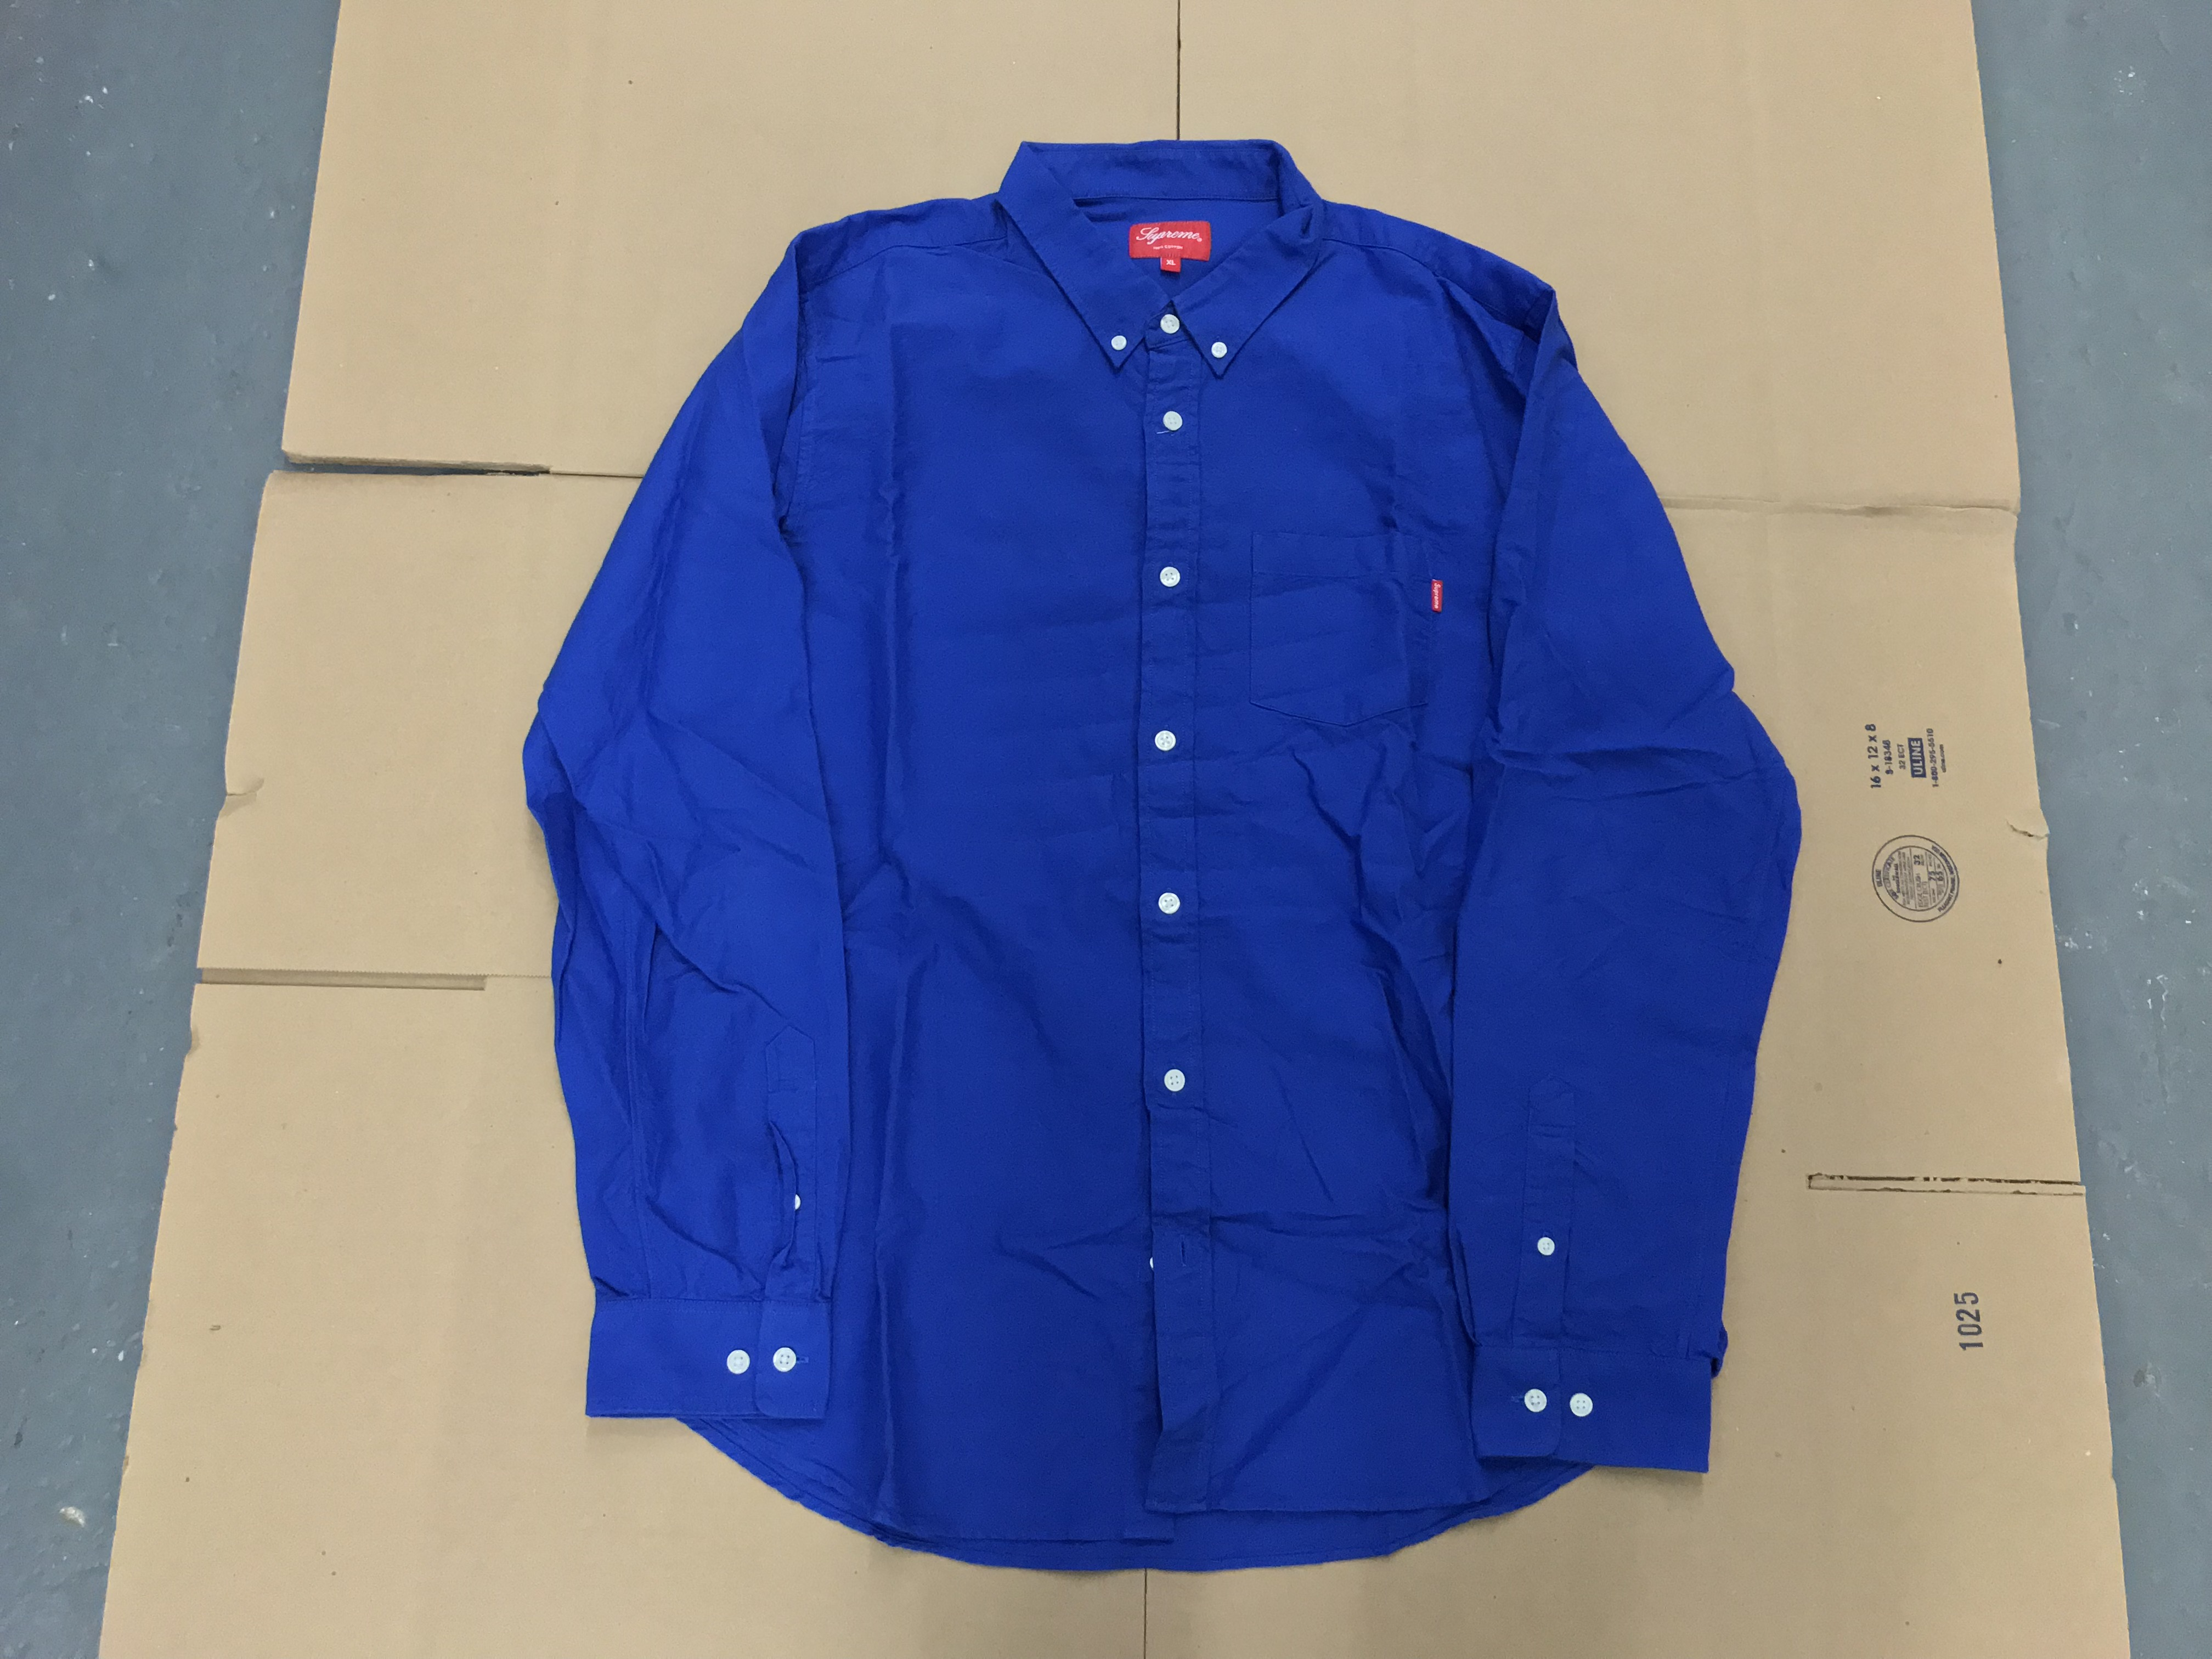 ec82c782fd9a Supreme Supreme Royal Blue Button Up Shirt Sz Xl | Grailed